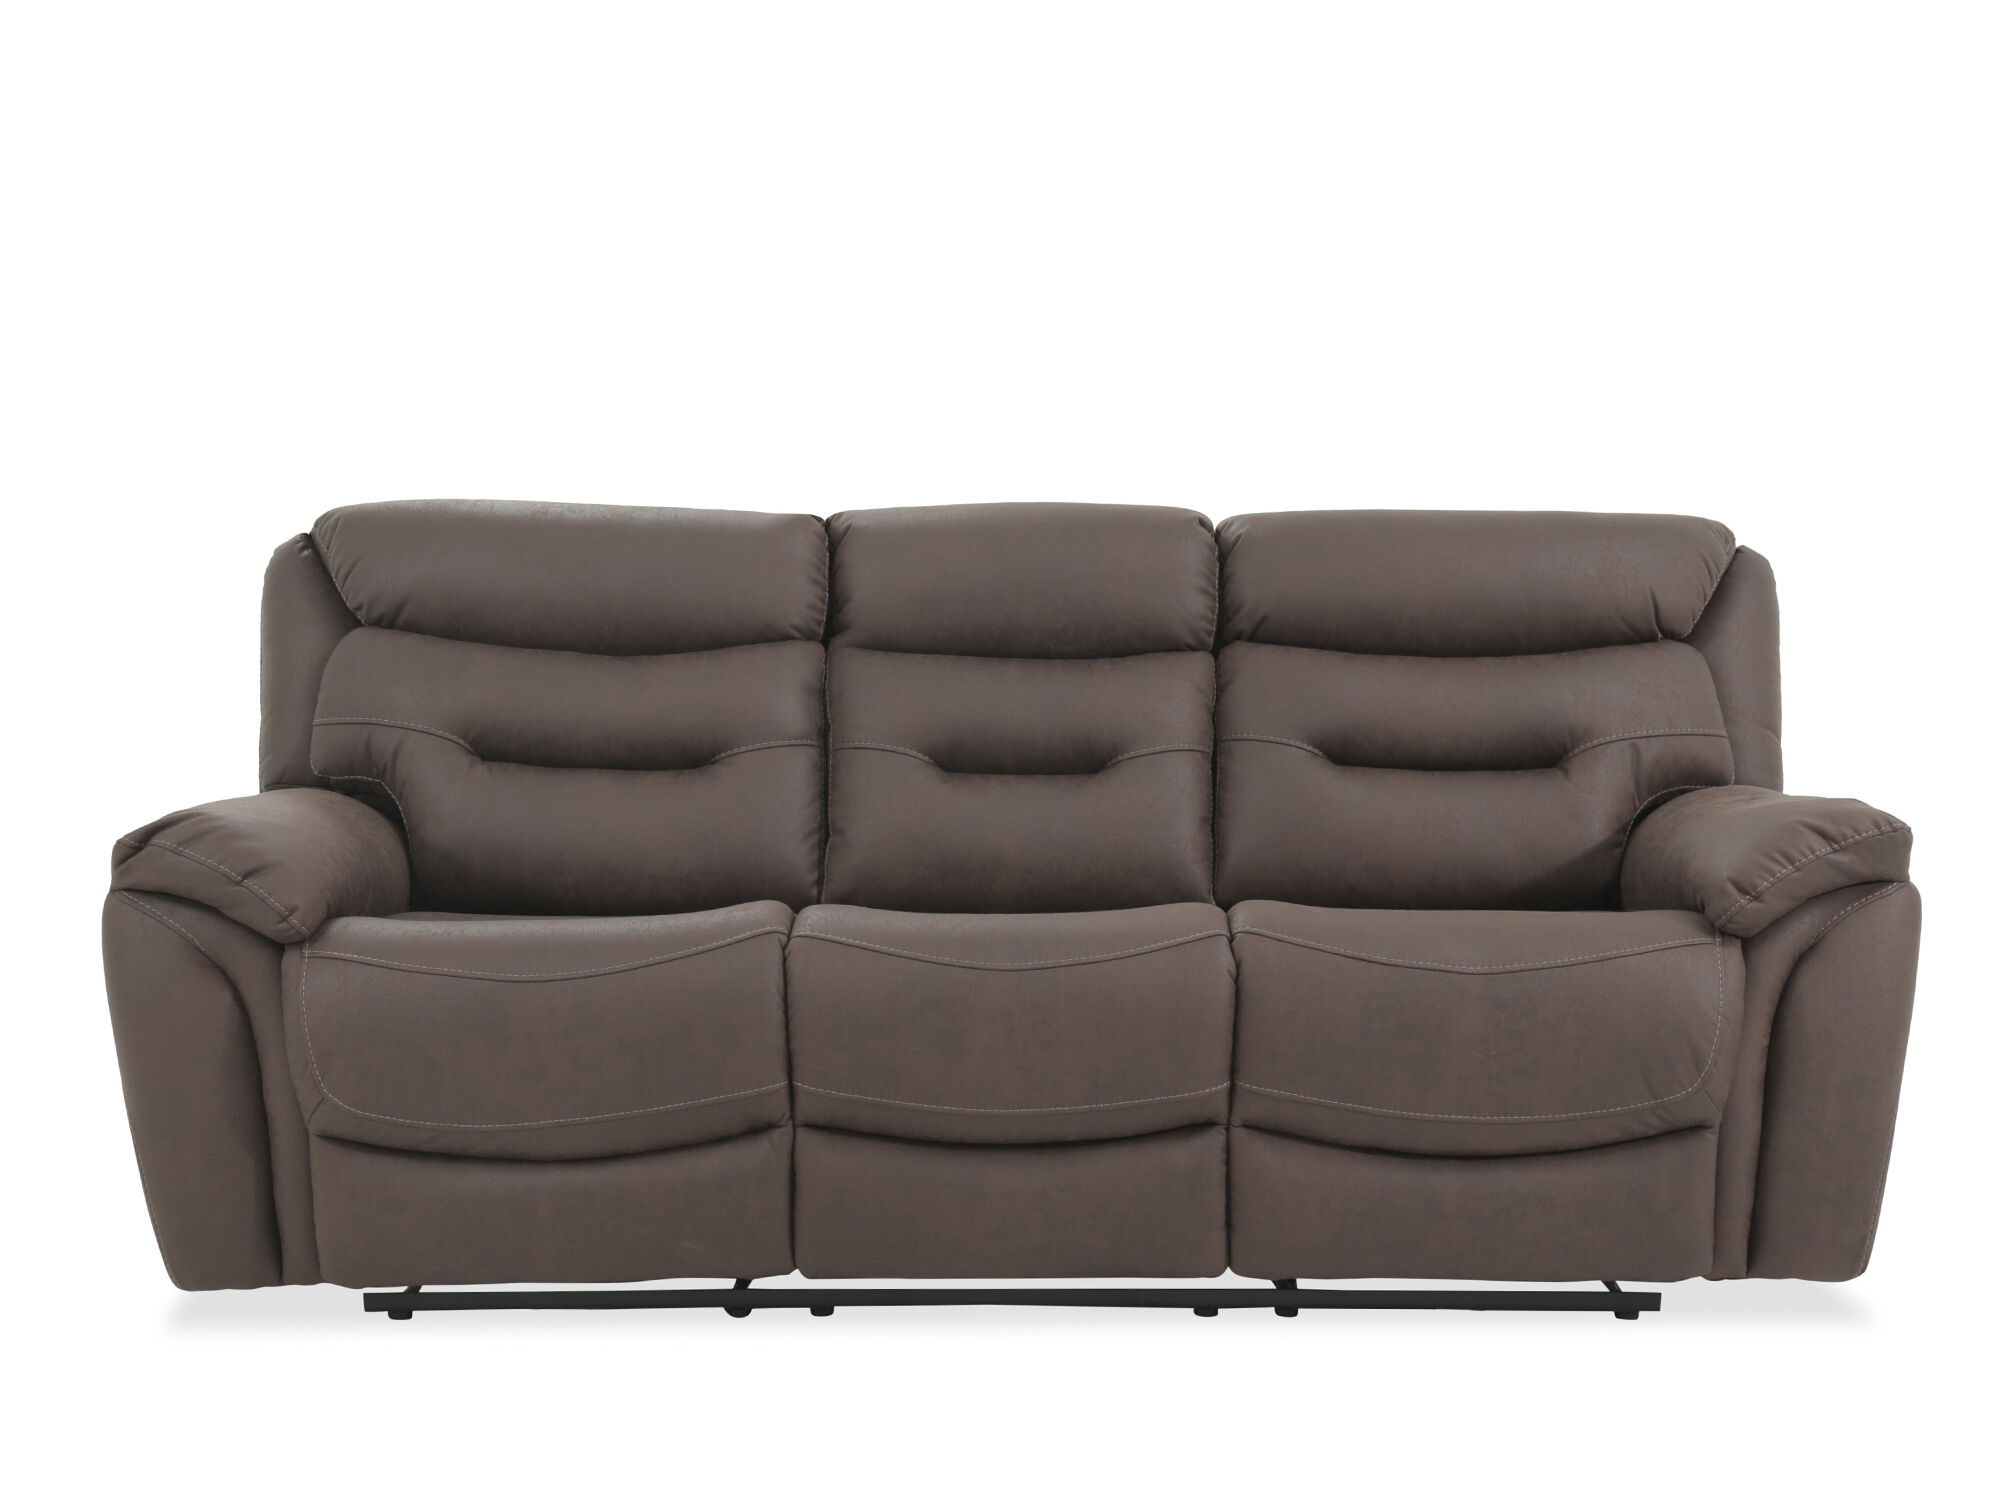 Casual 90u0026quot; Power Reclining Sofa In ...